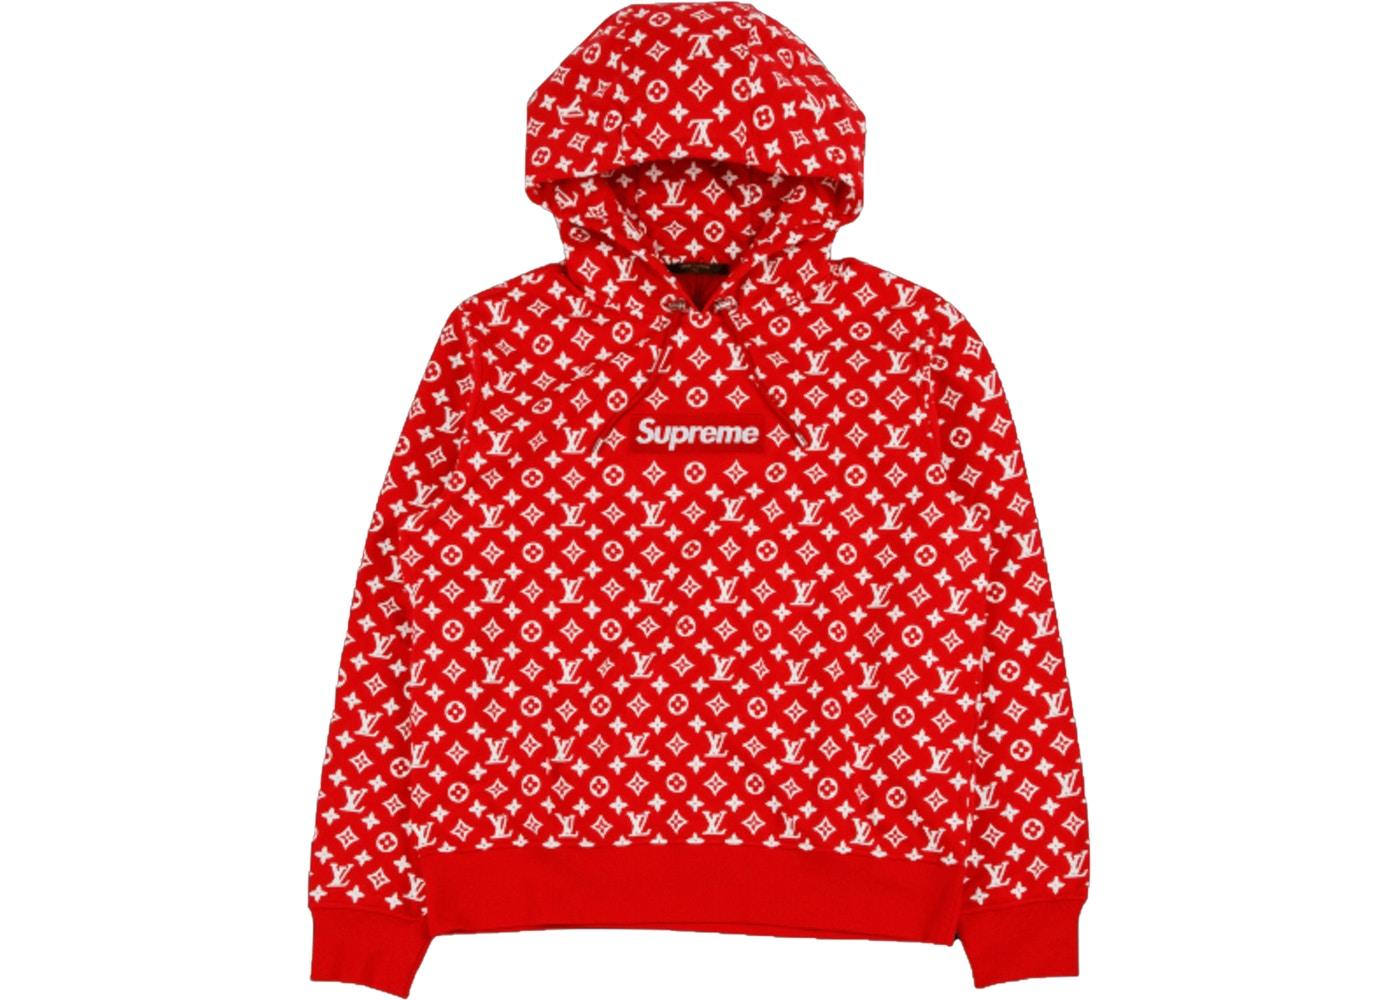 Supreme x Louis Vuitton Box Logo Hooded Sweatshirt Red.